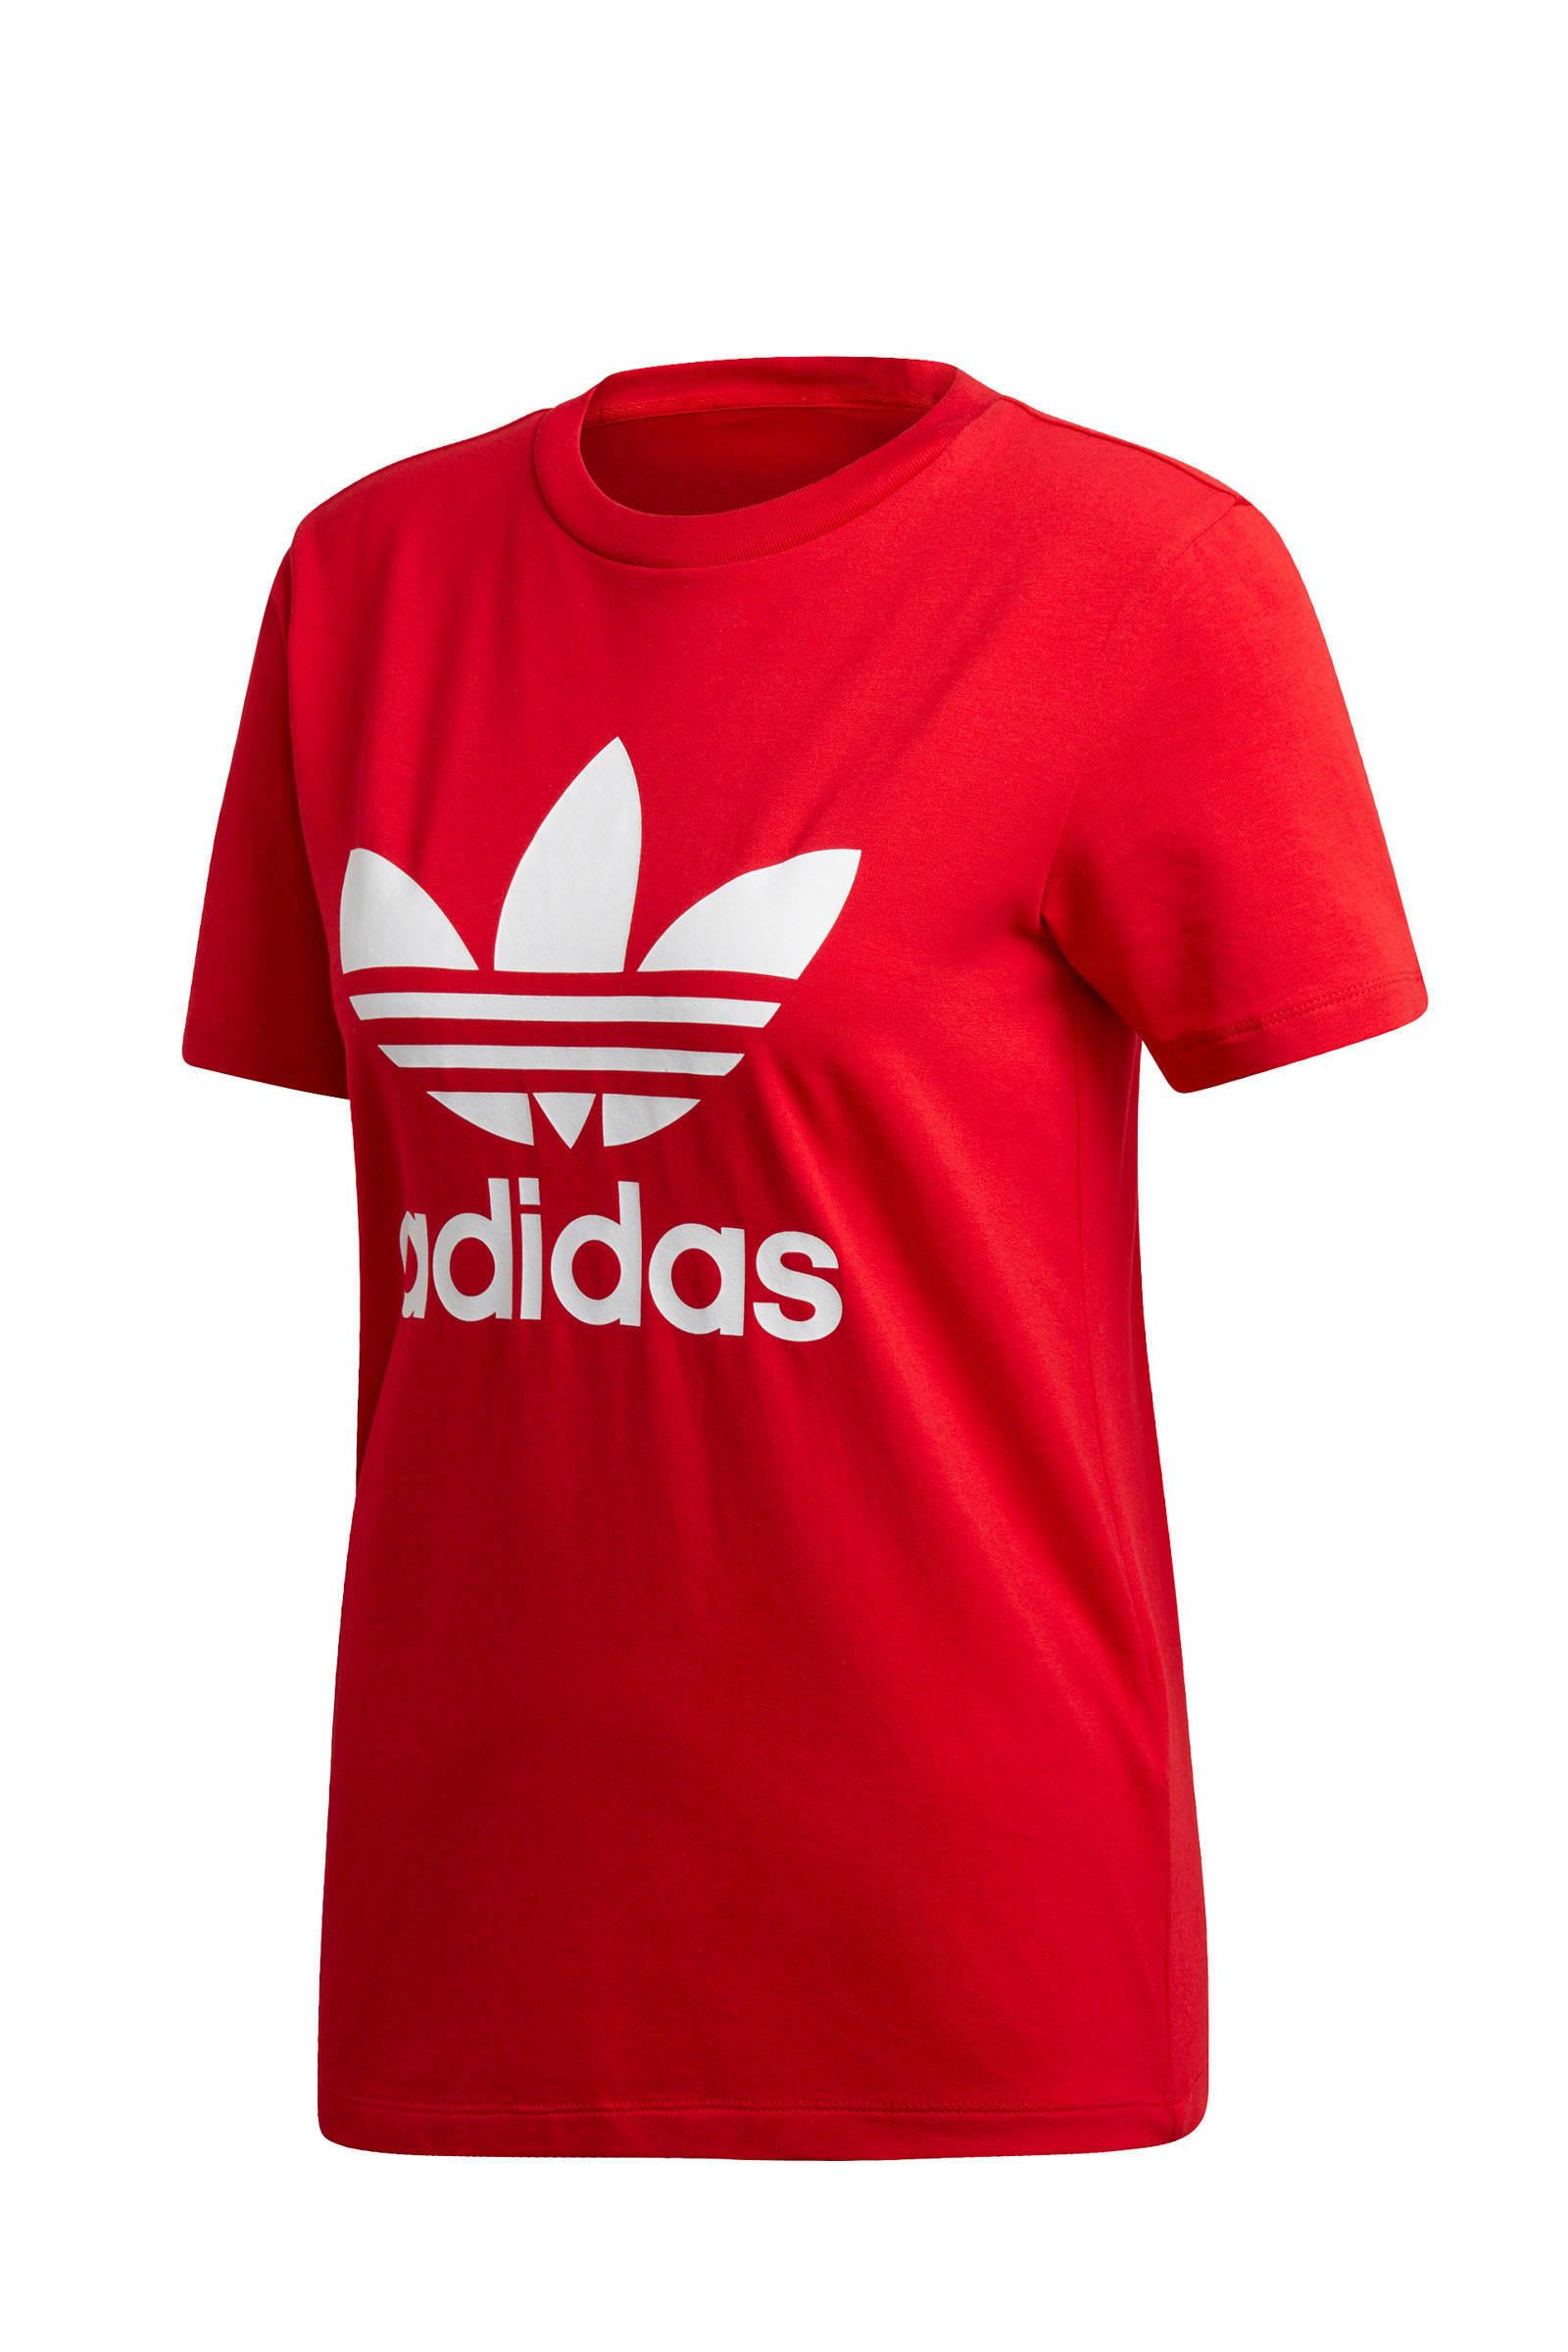 adidas originals Adicolor T shirt rood | wehkamp